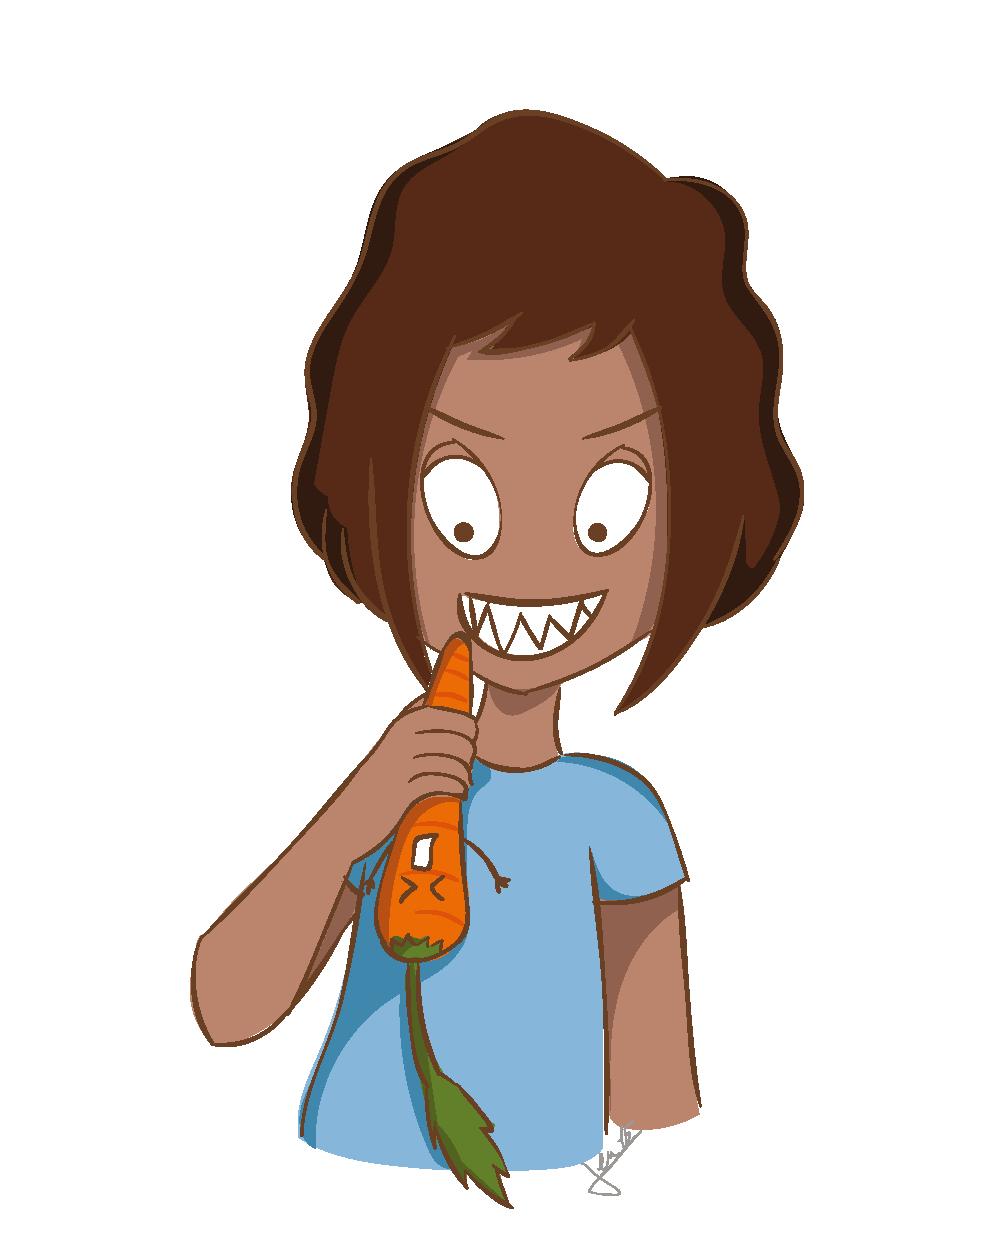 Ex. 2 Le cri de la carotte